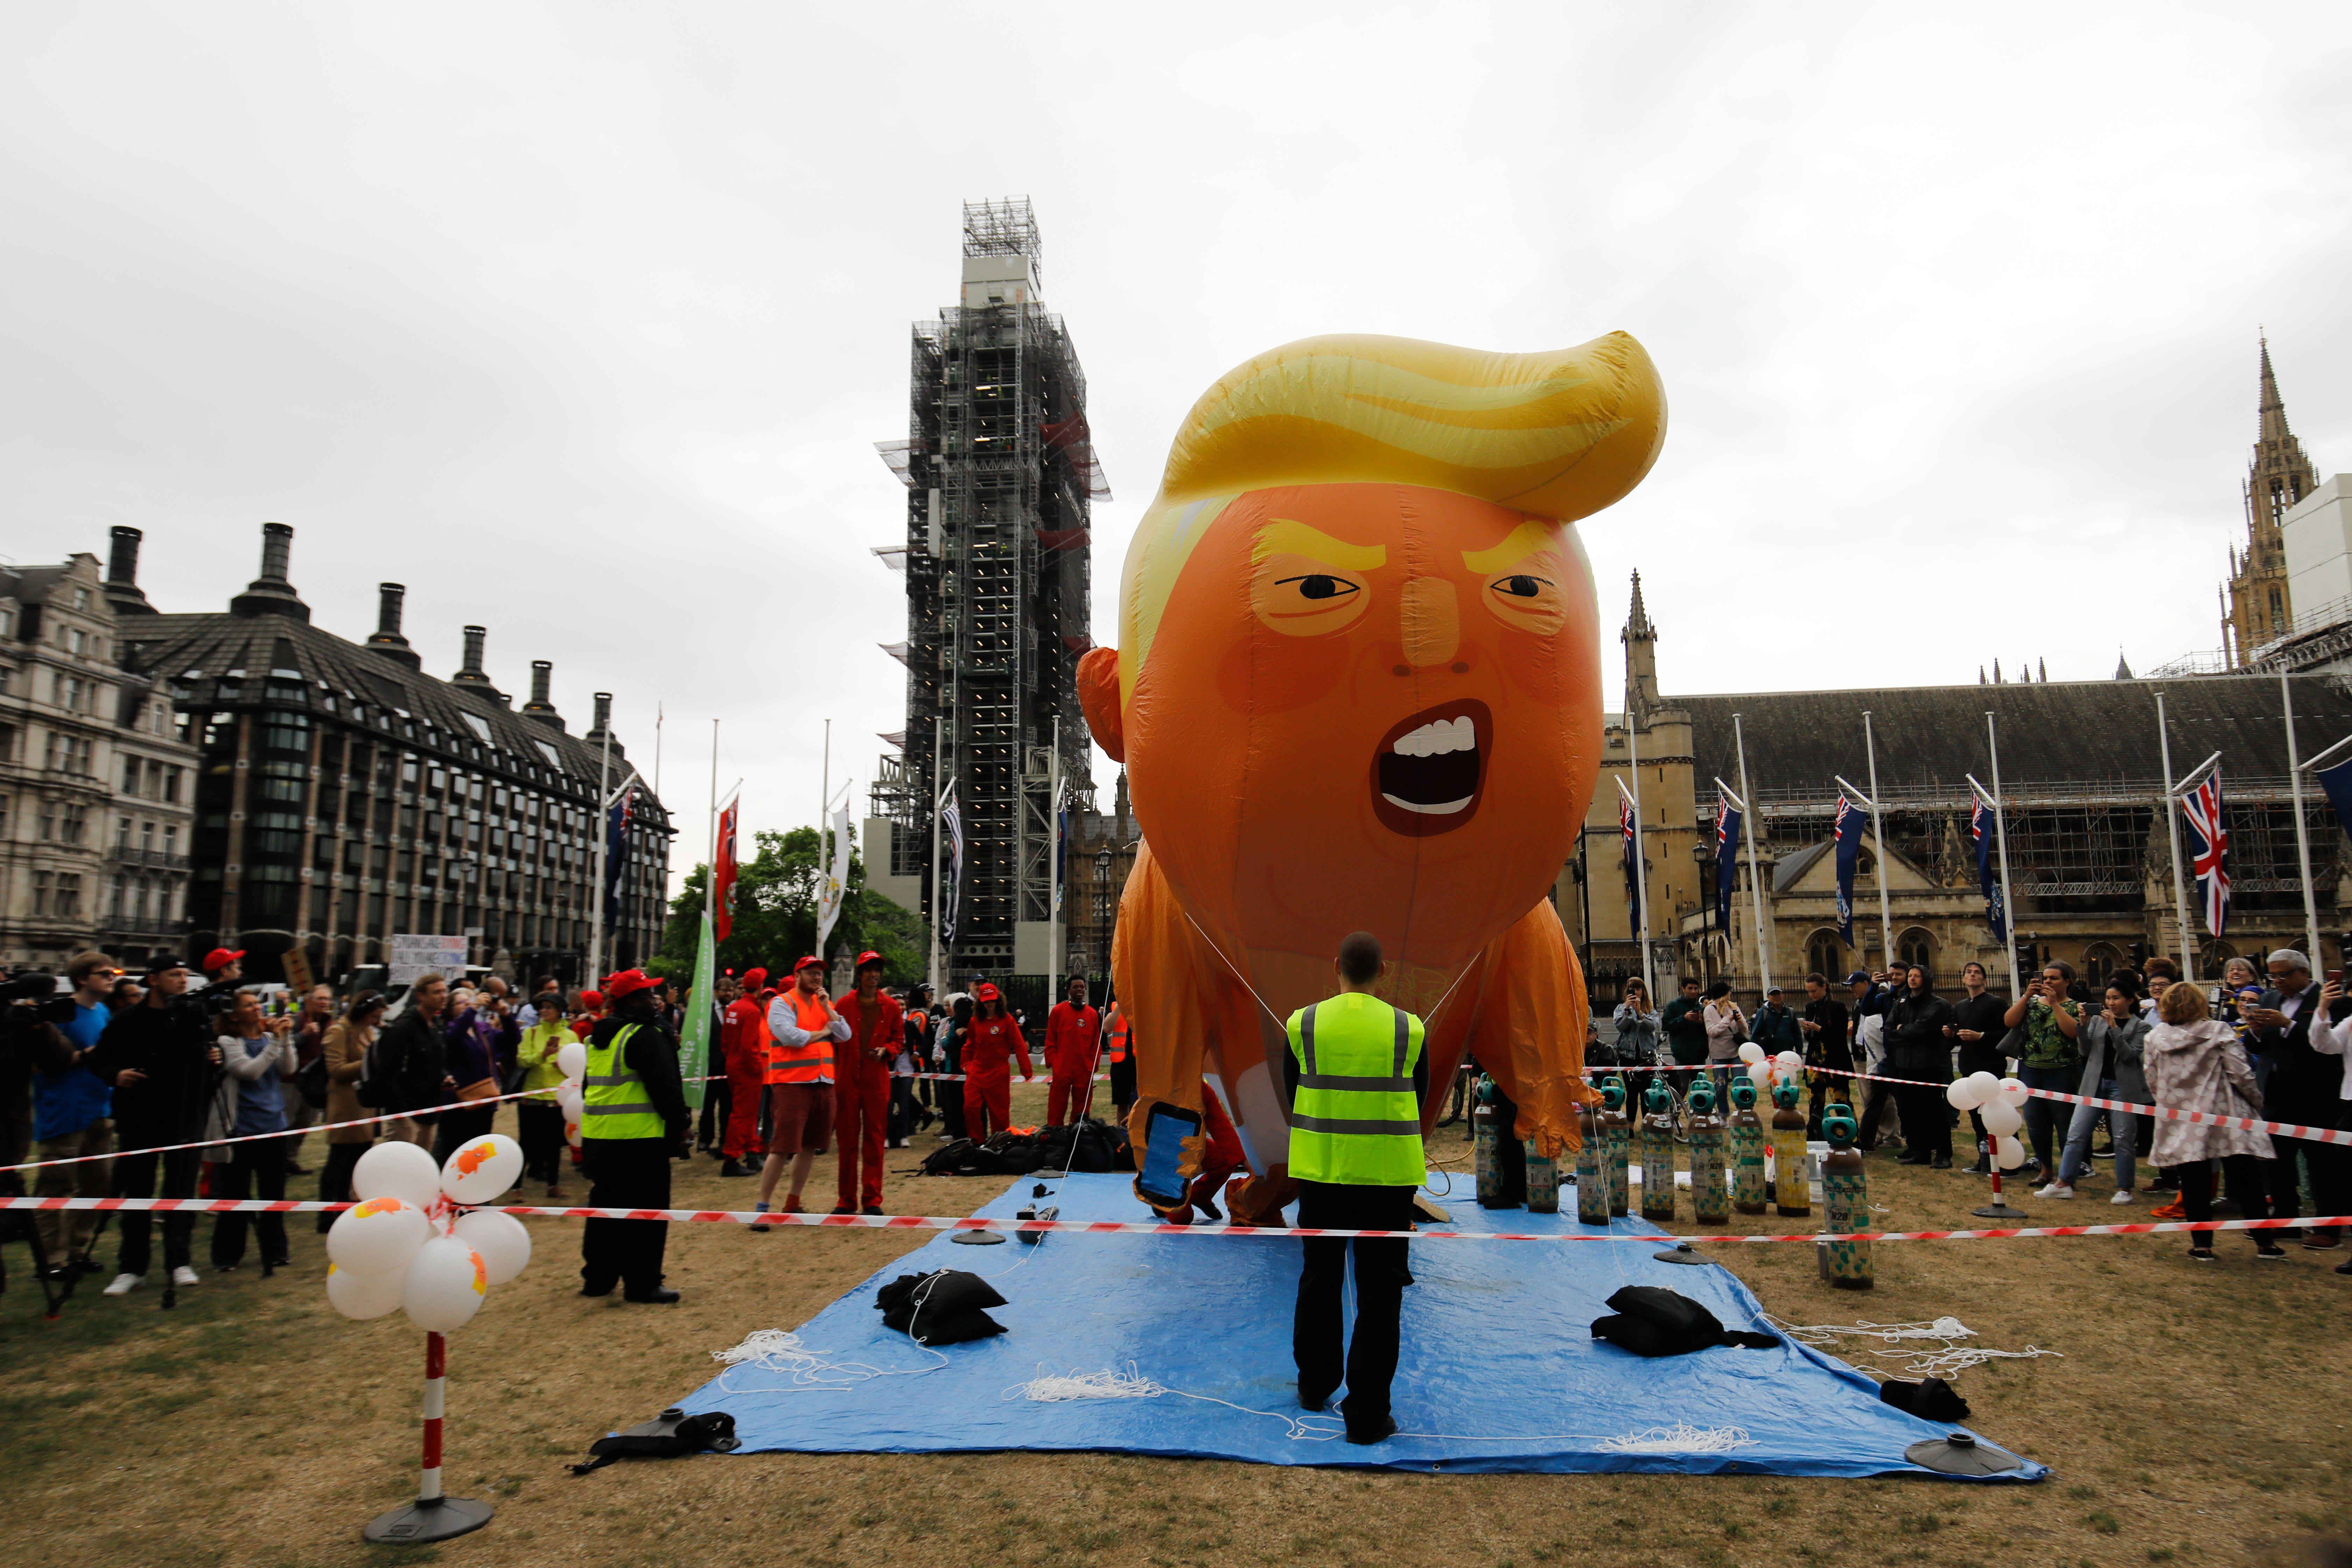 TOLGA AKMEN/AFP/Getty Images